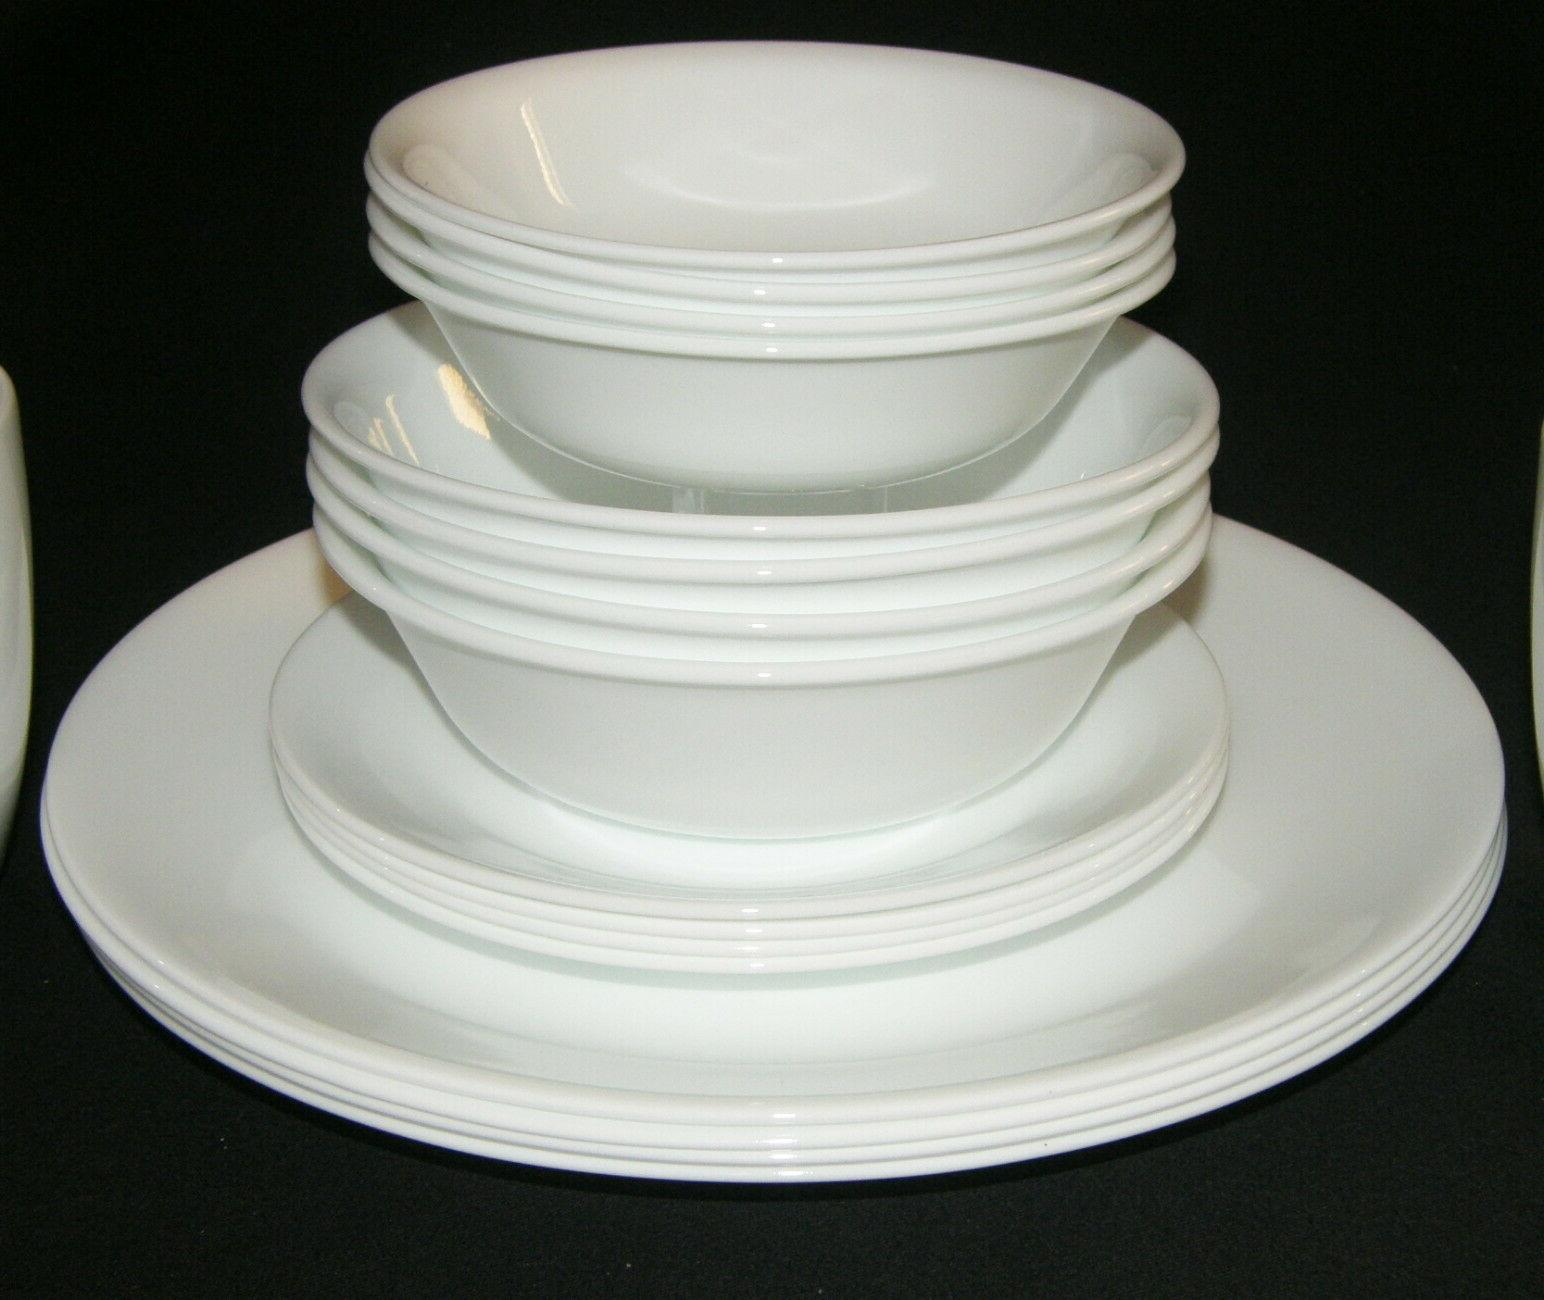 NEW LivingWare Winter White Dinnerware Set